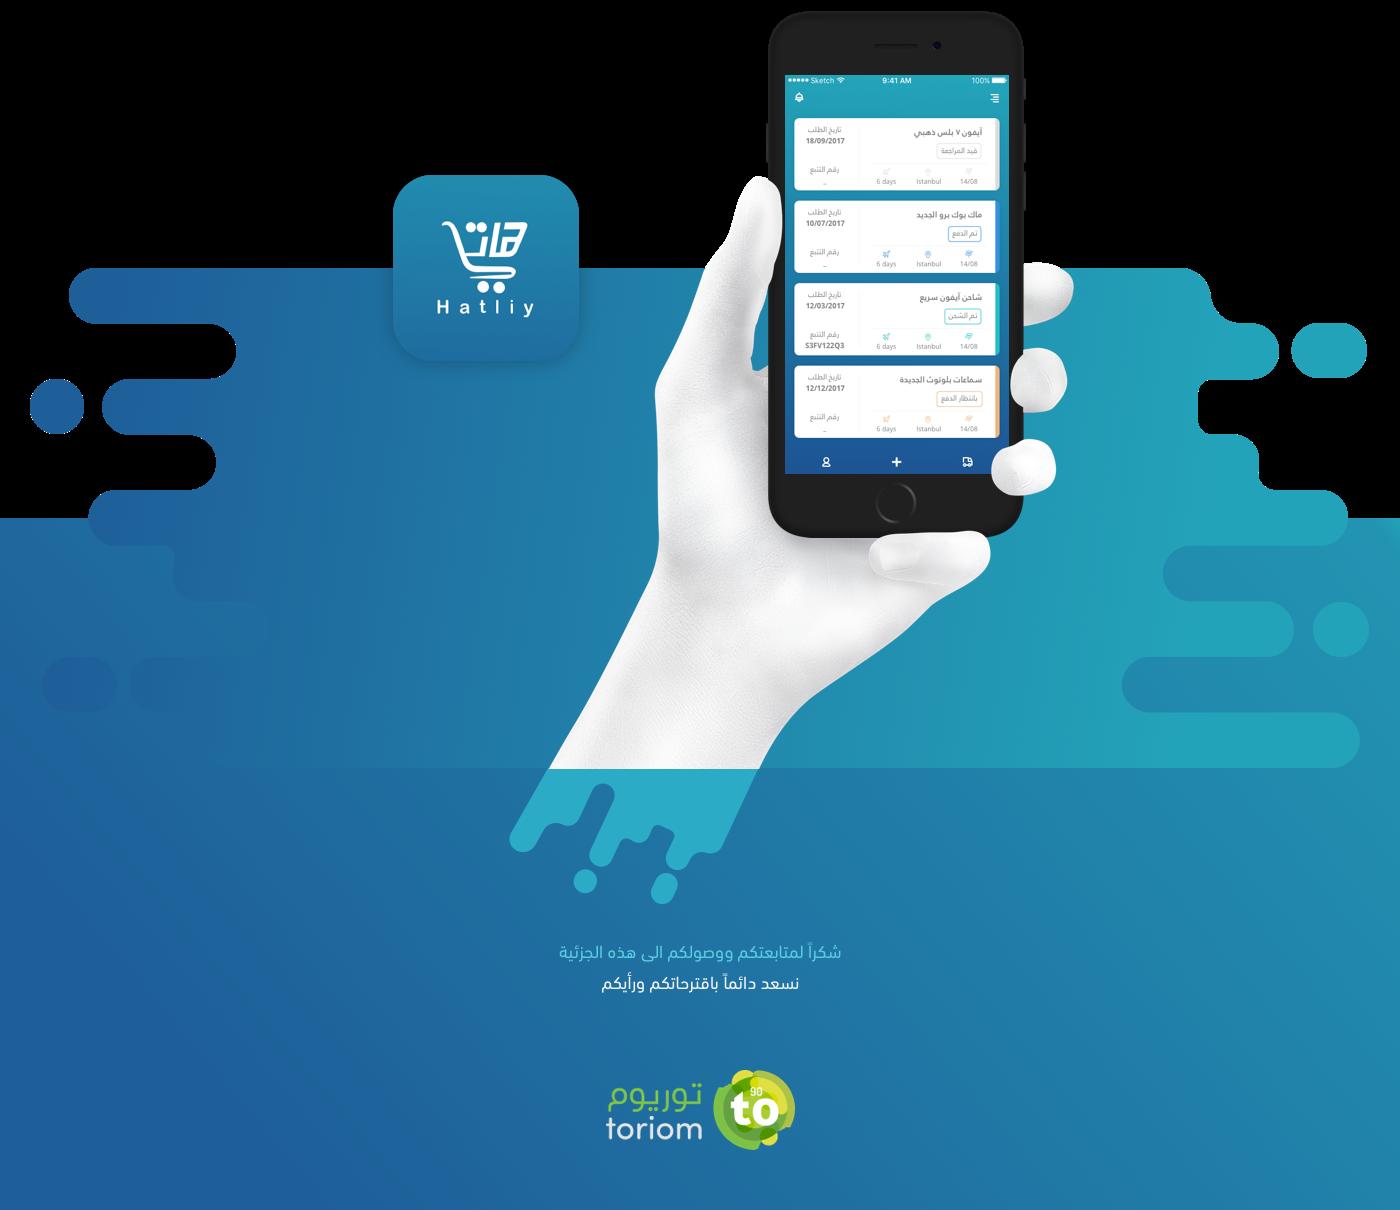 hatliy هاتلي shopping app iOS App app ui تطبيق هاتلي Android App Application Design mobile app devlopment arabic app